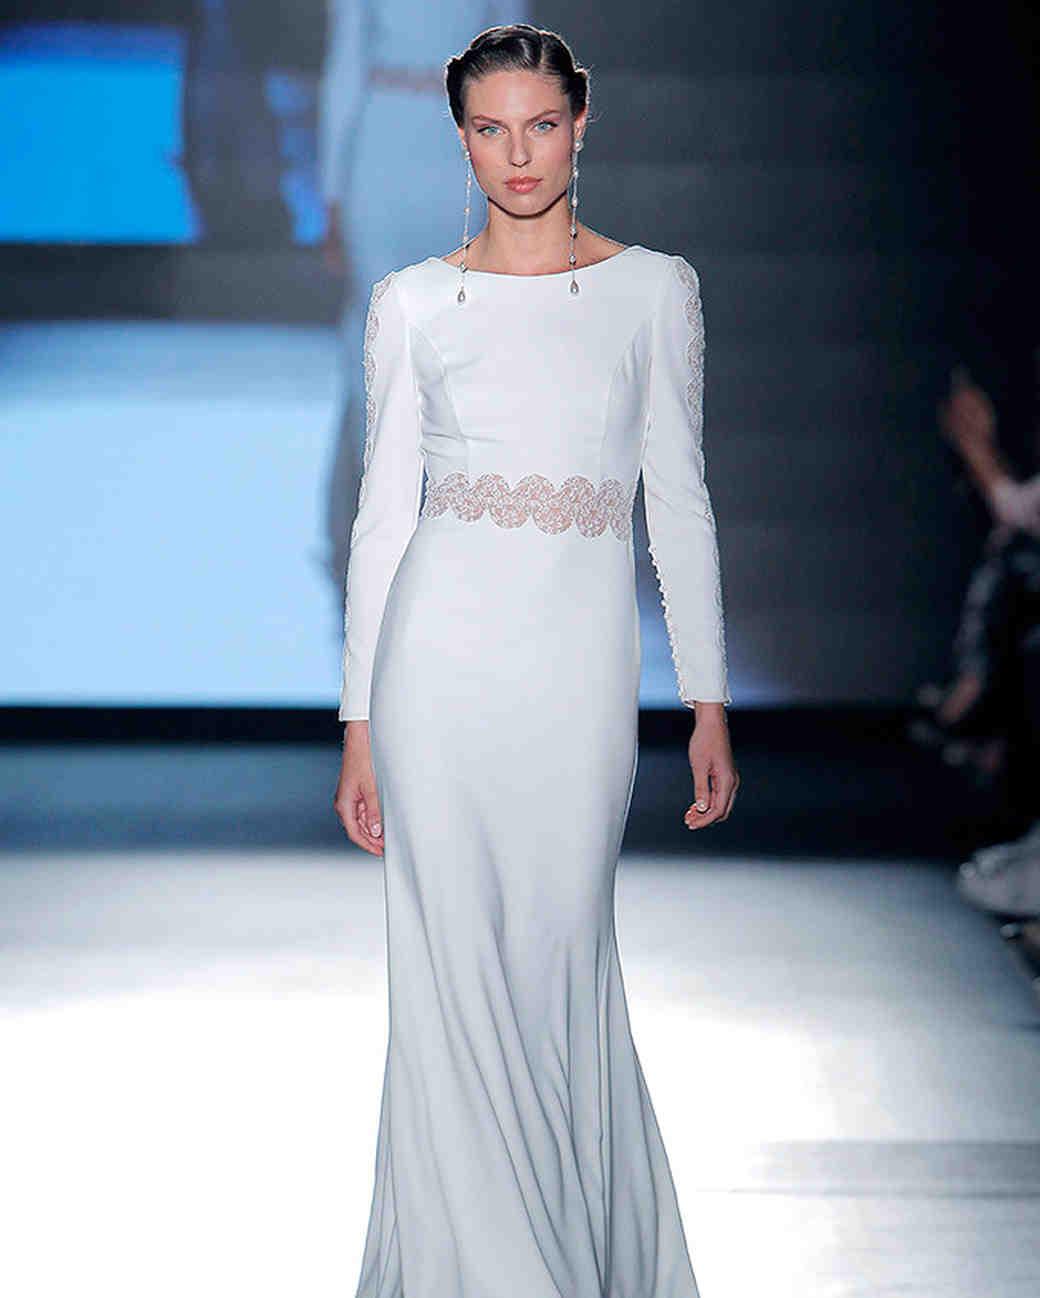 Meghan Markle\'s Wedding Dress: Get the Look | Martha Stewart Weddings